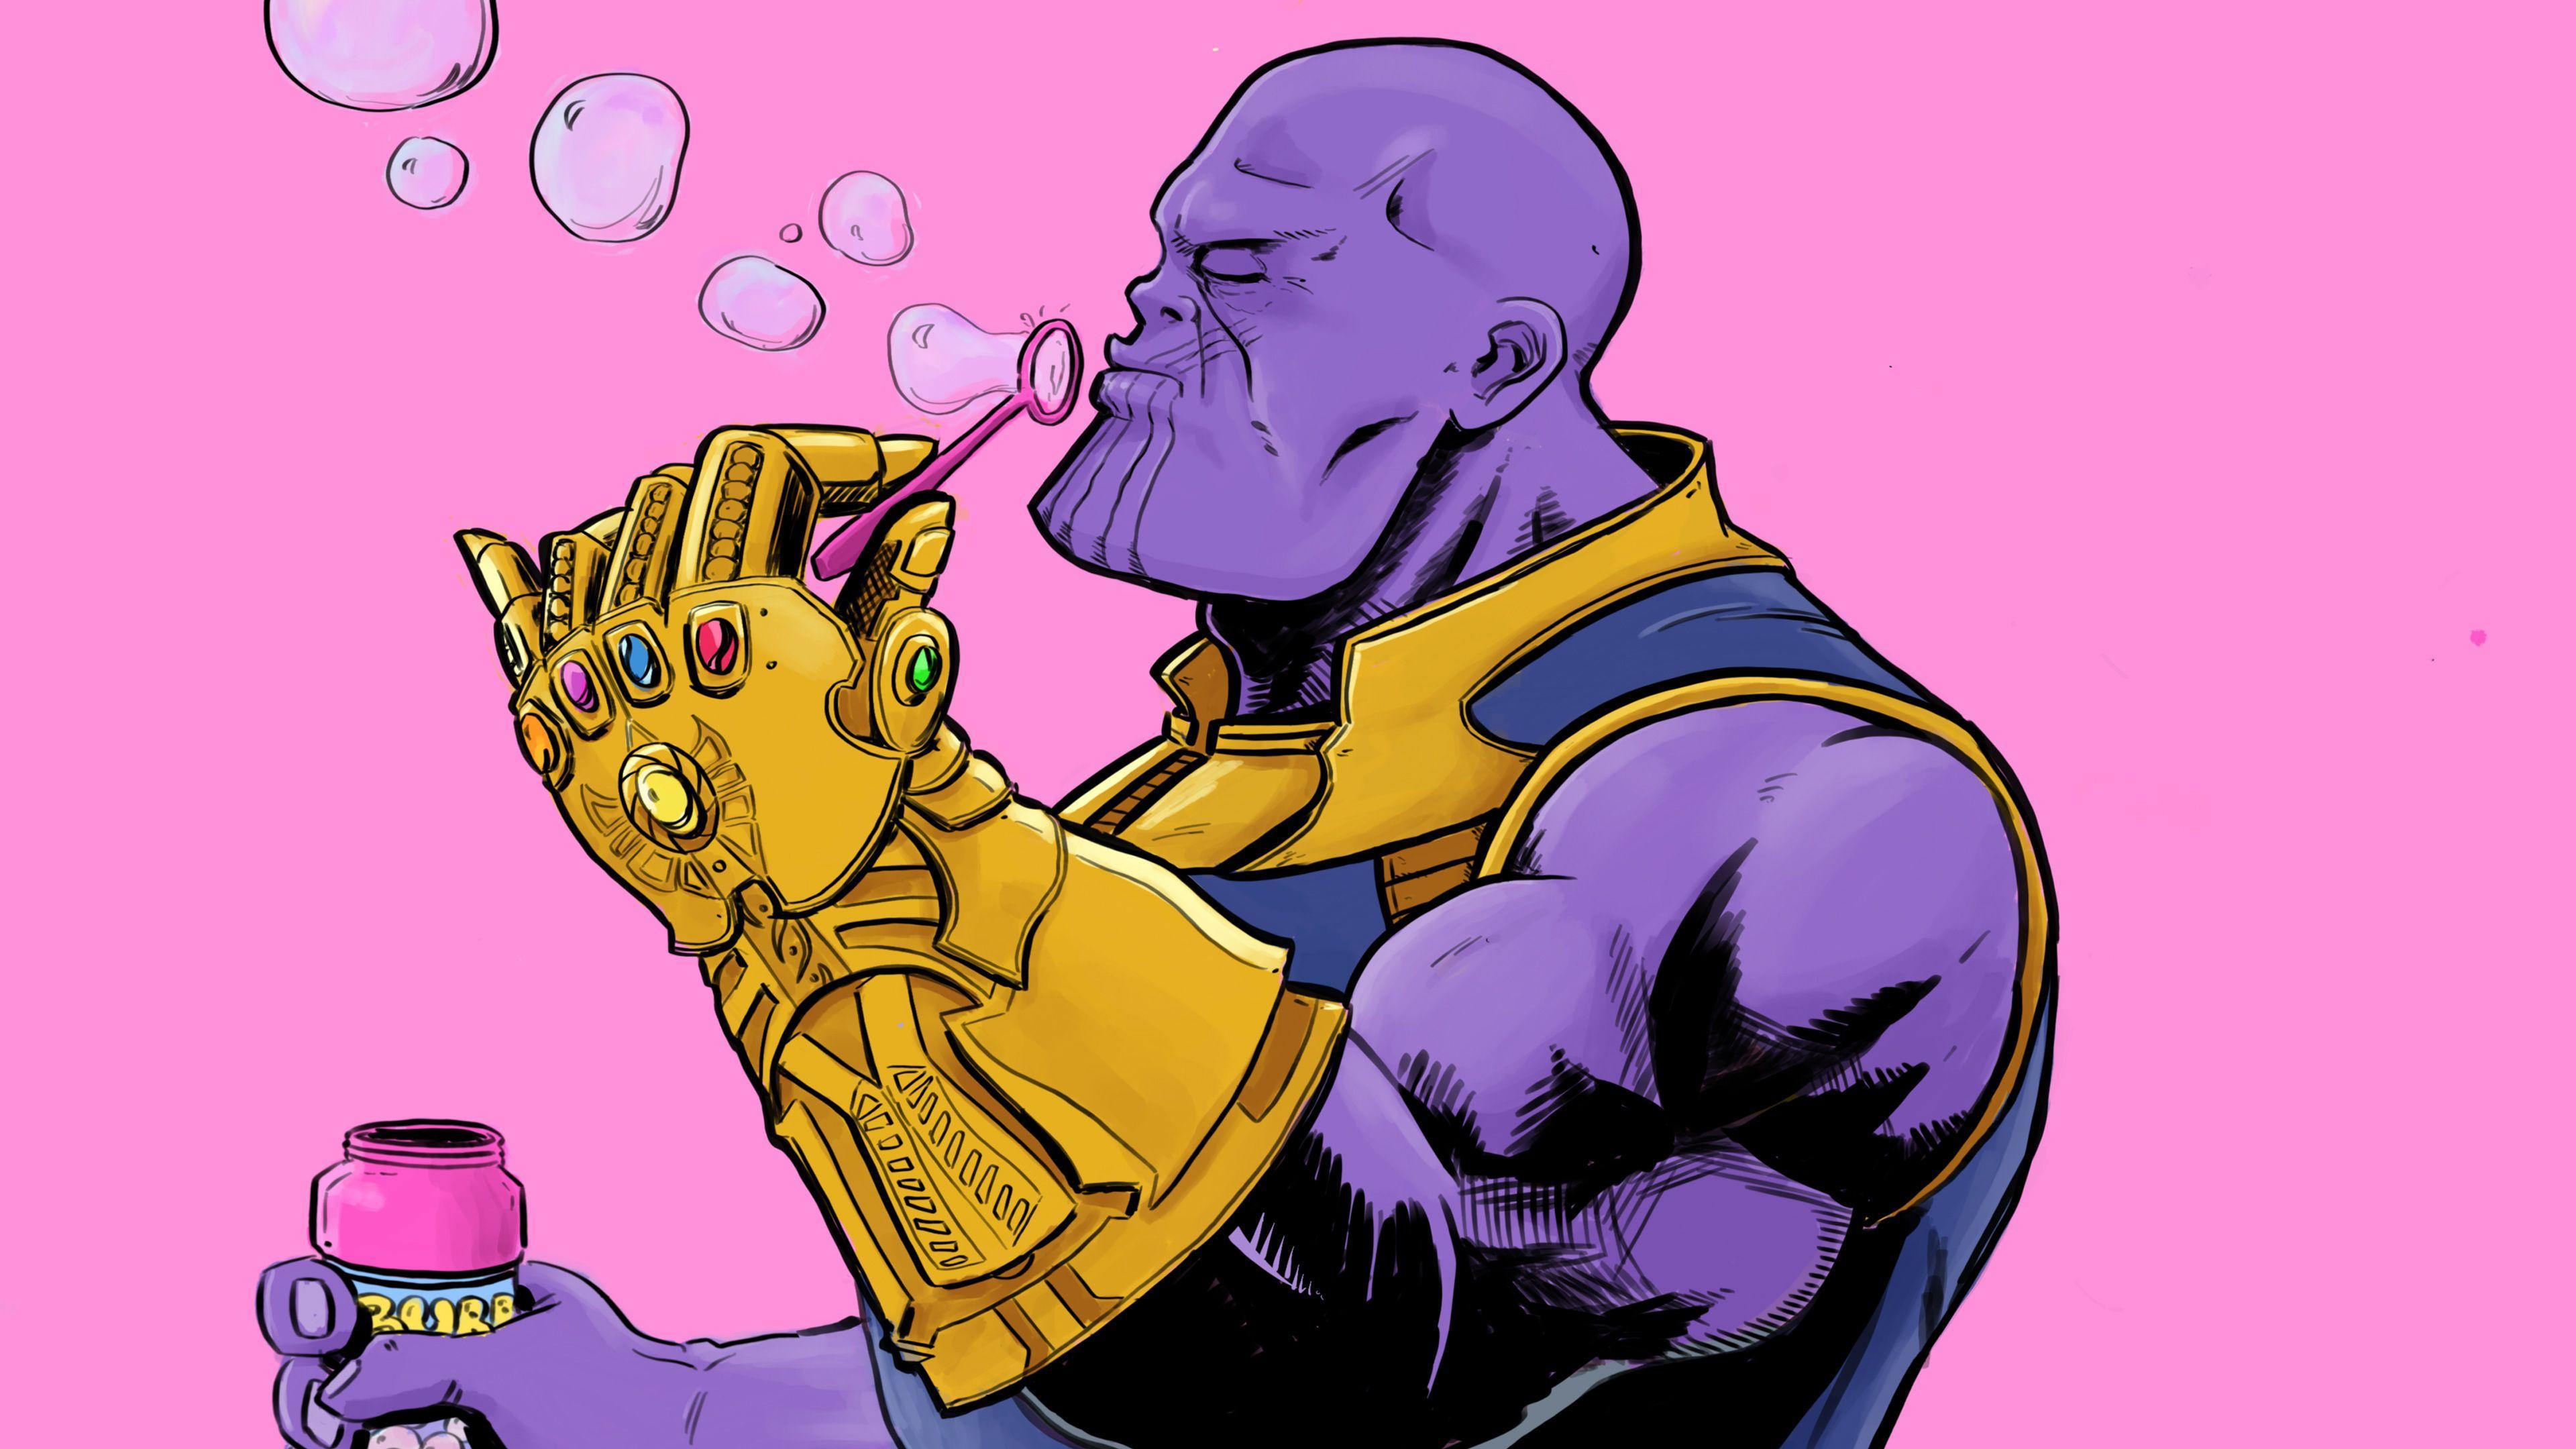 Thanos Meme Wallpapers Top Free Thanos Meme Backgrounds